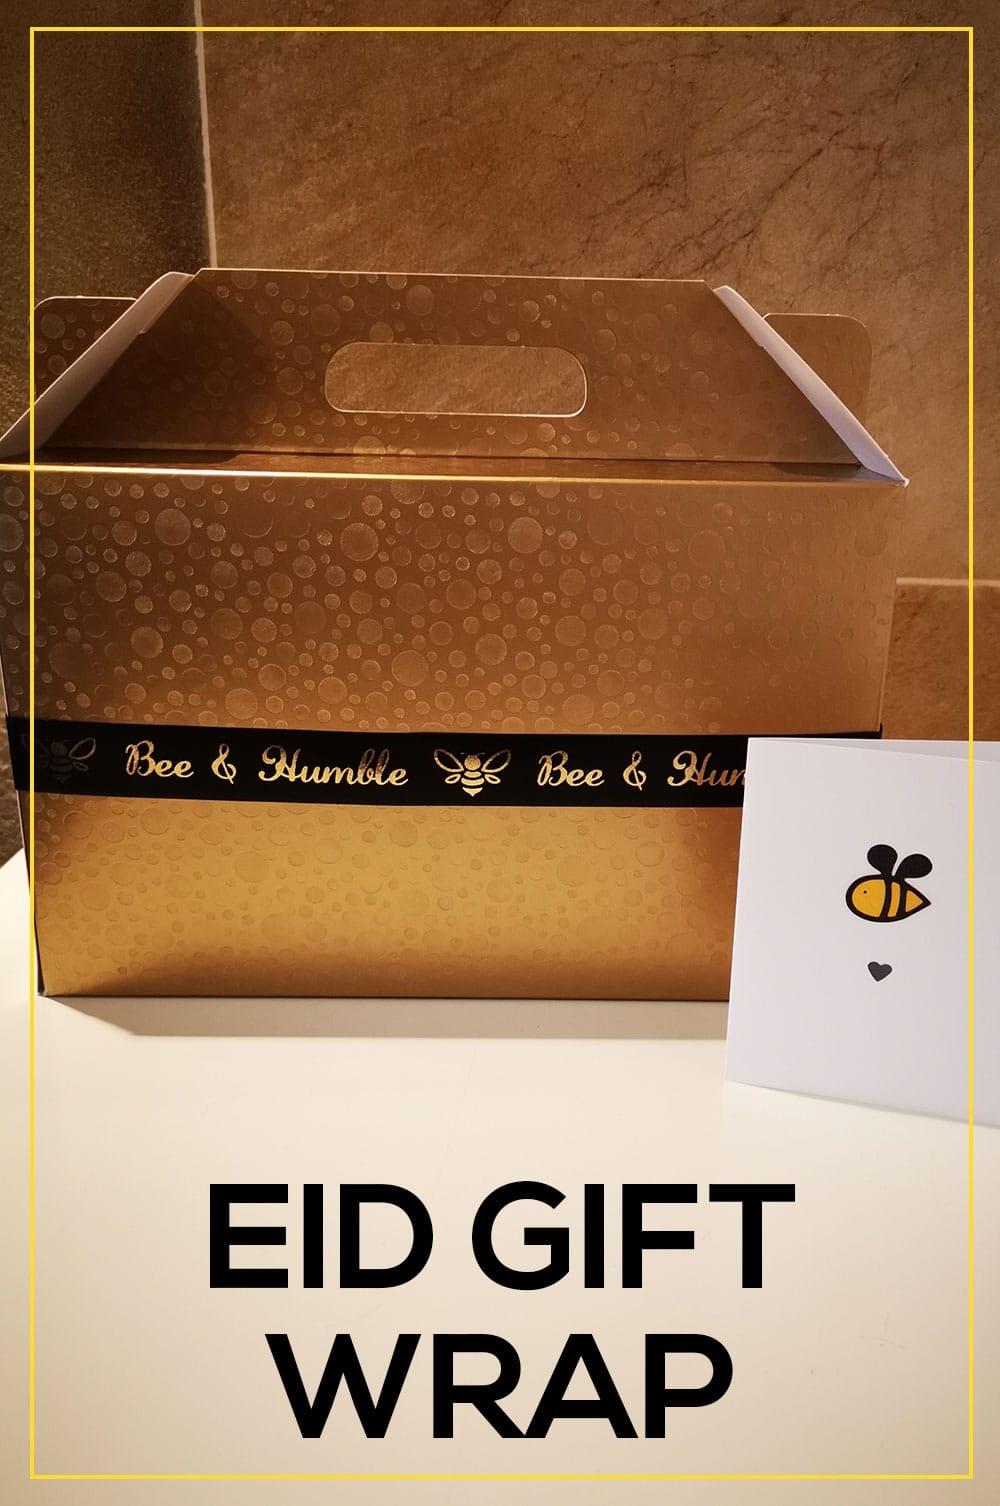 eid gift box and eid card  bee and humble